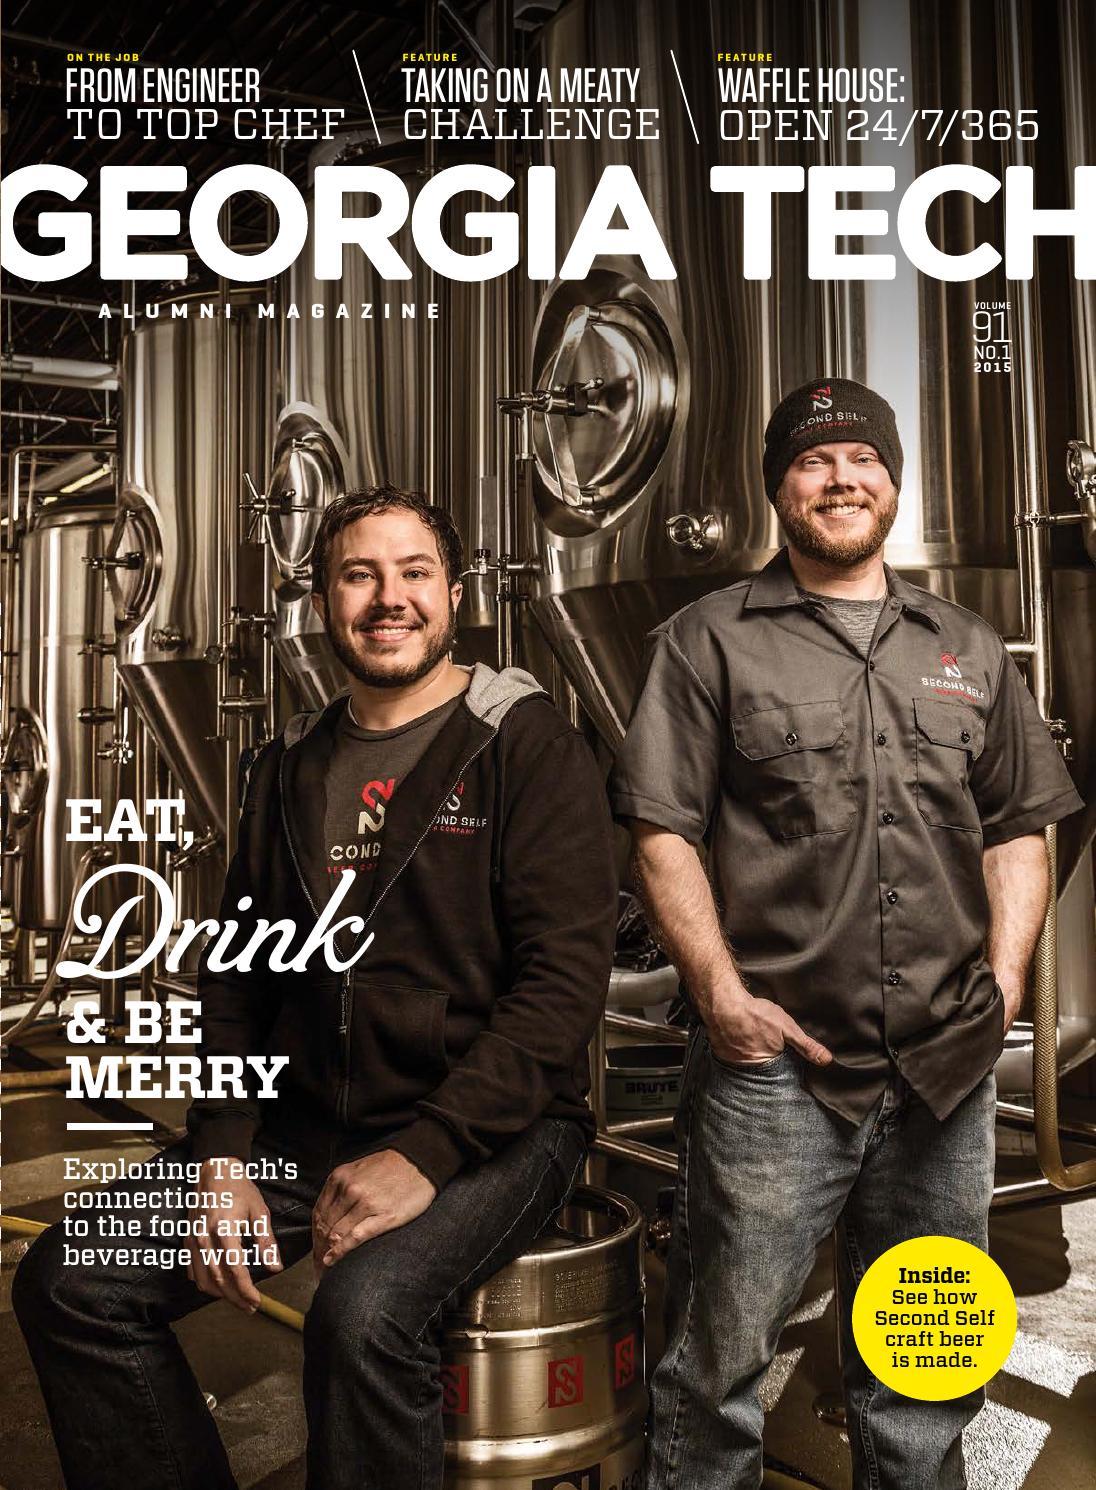 Georgia Tech Alumni Magazine, Vol. 91 No. 1 2015 by Georgia Tech ...